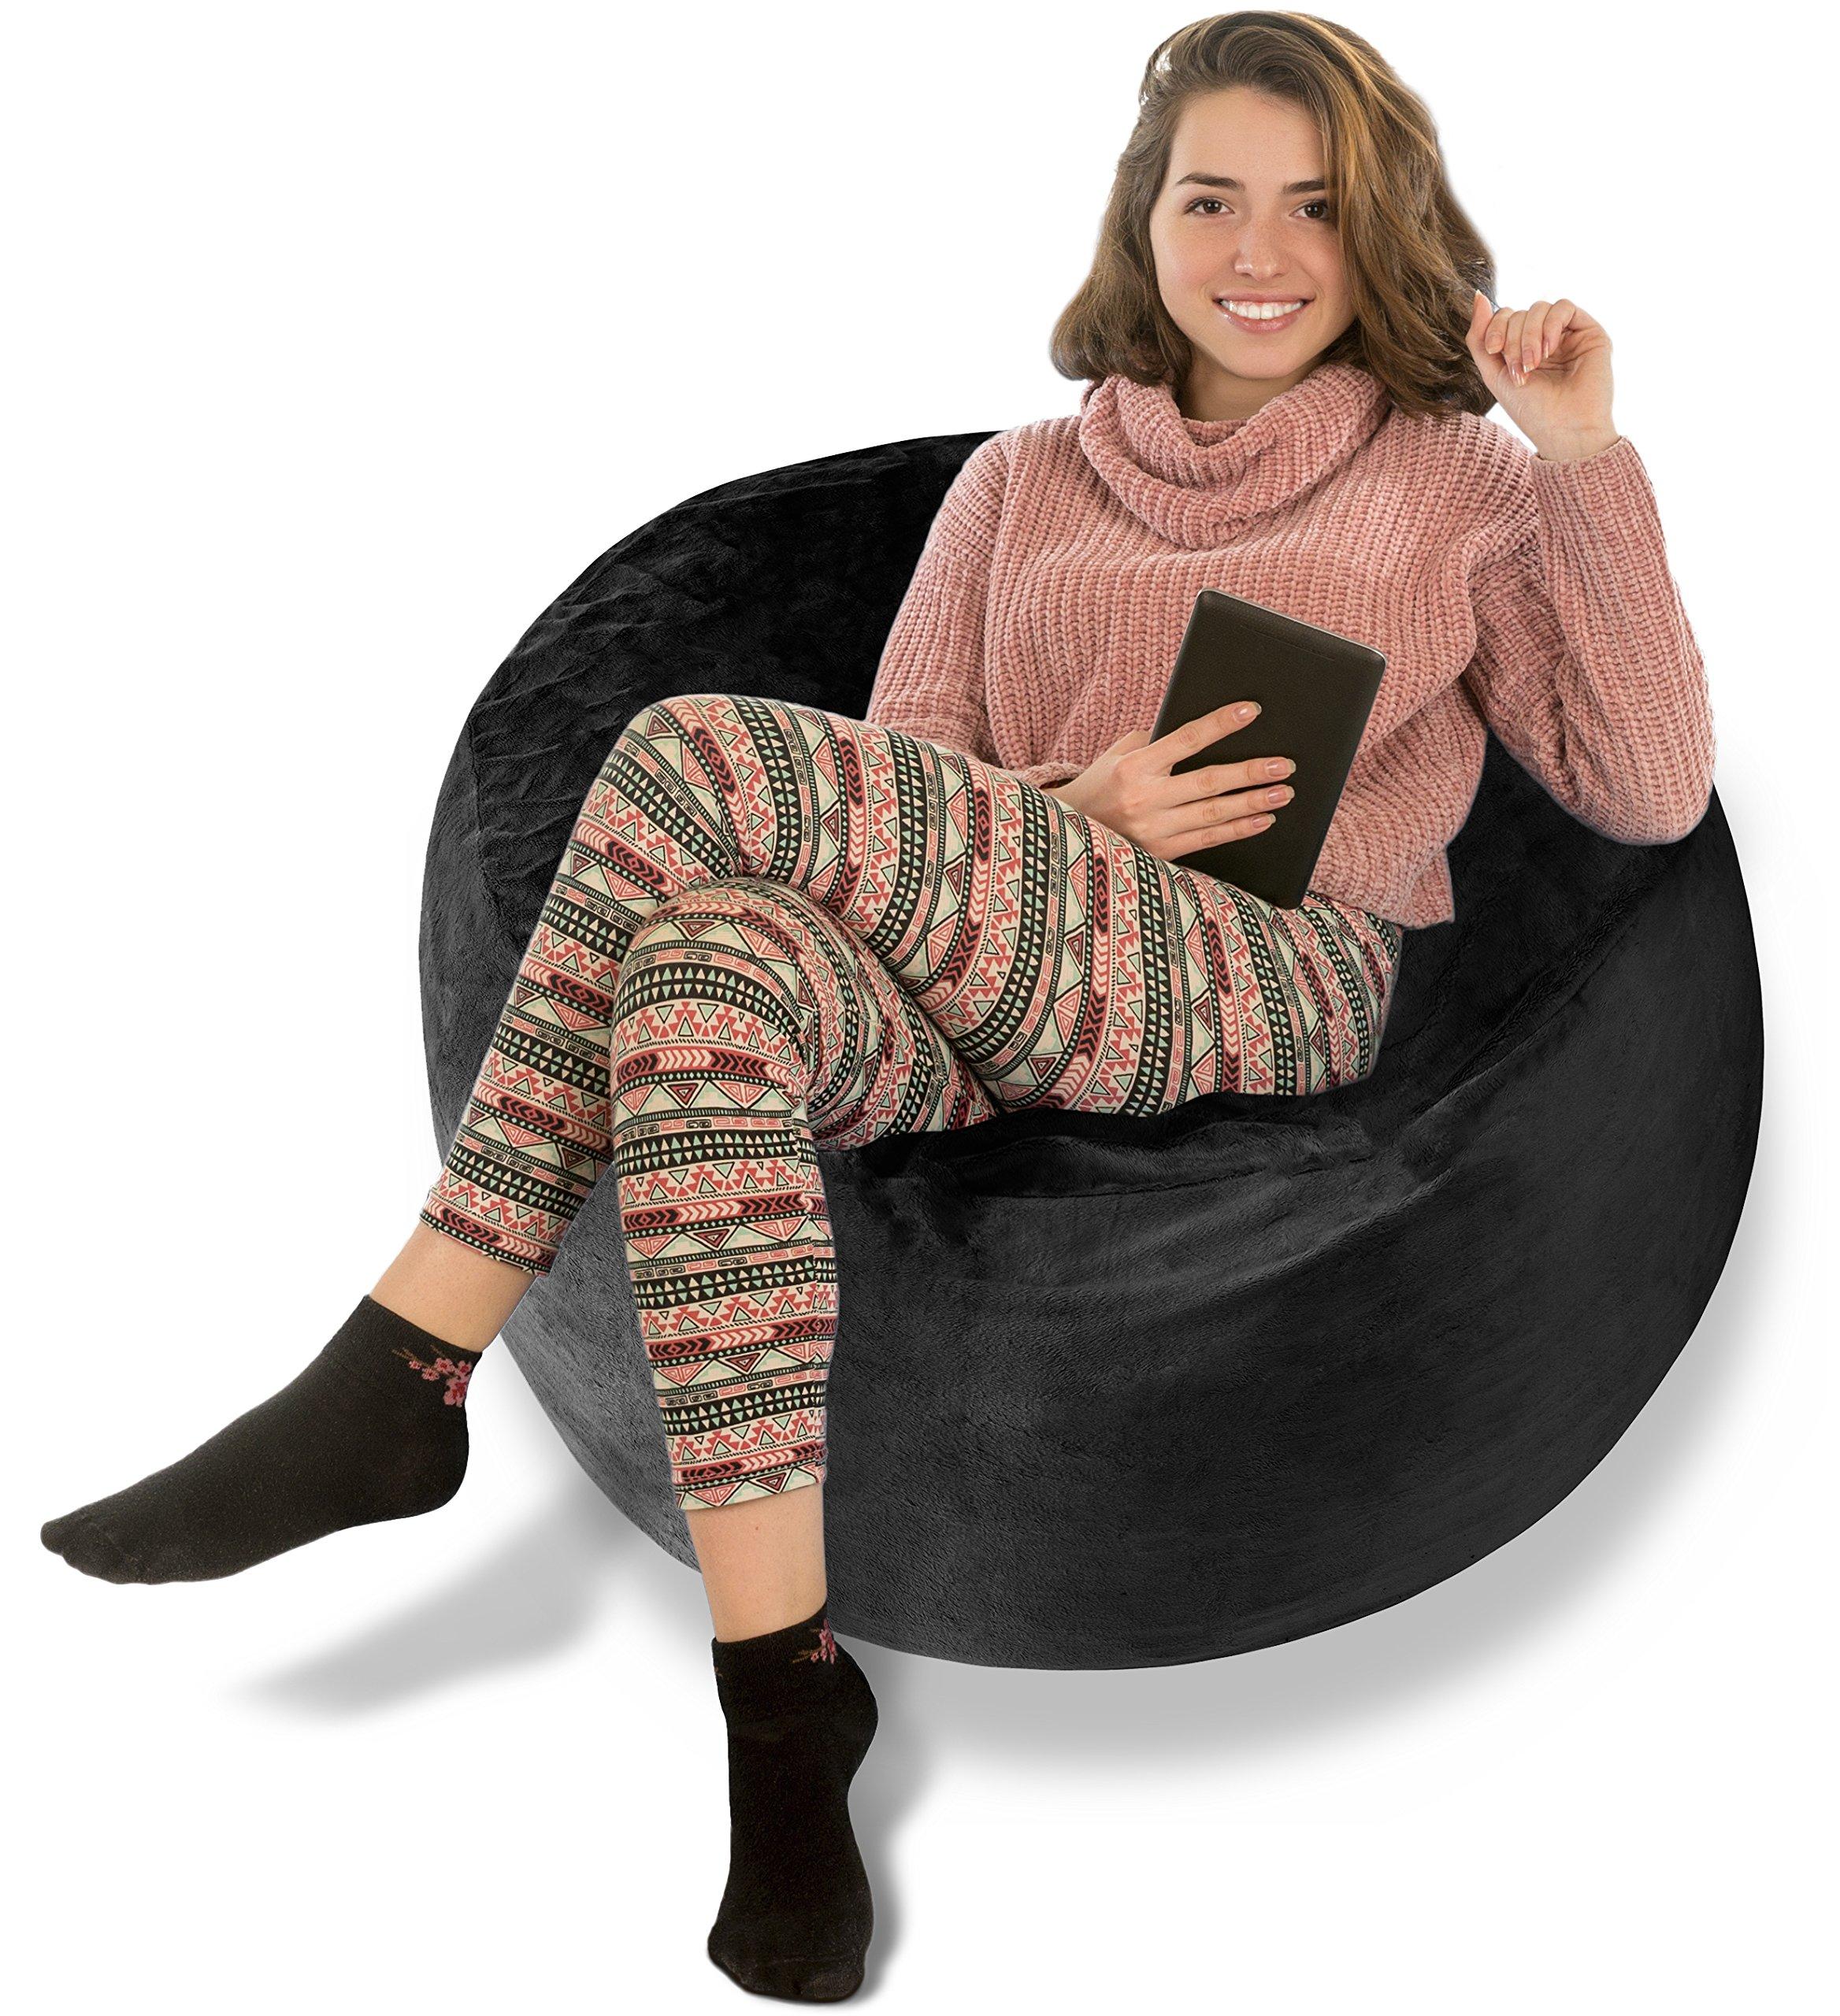 BeanBob Bean Bag Chair (Limo Black), 3ft - Bedroom Sitting Sack for Kids & Adults w/Super Soft Foam Filling